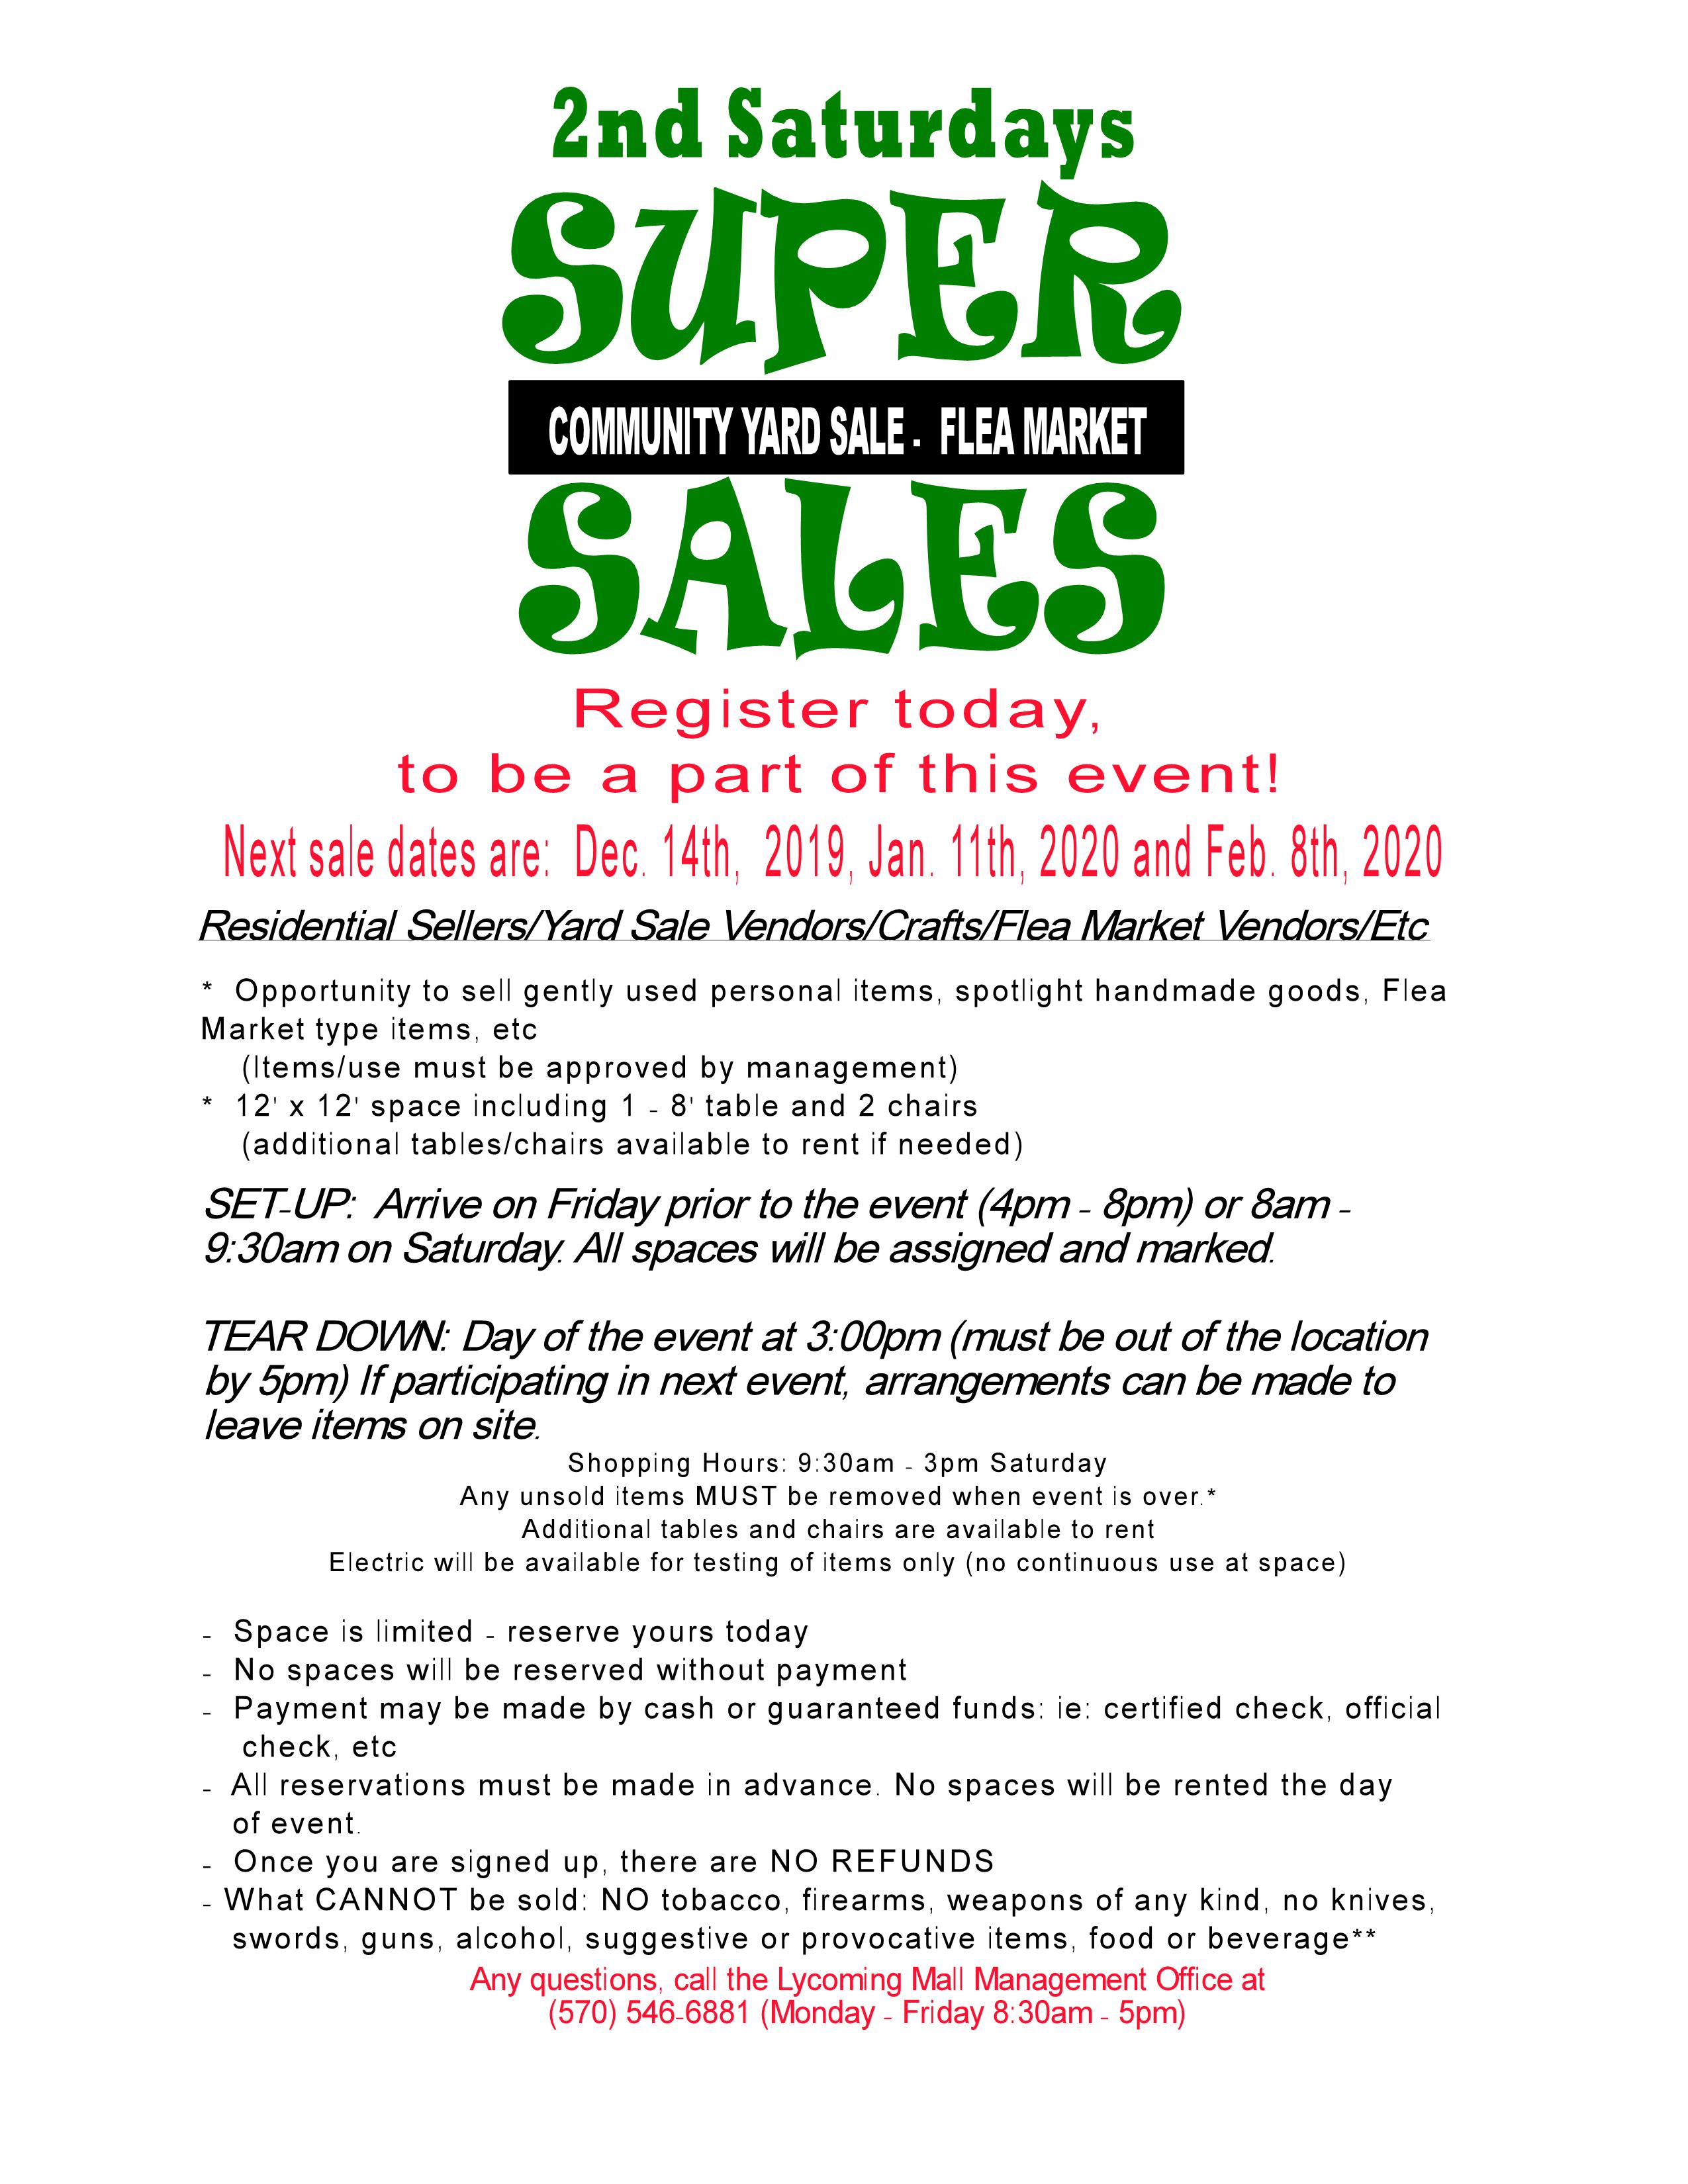 lycoming mall super saturday registration